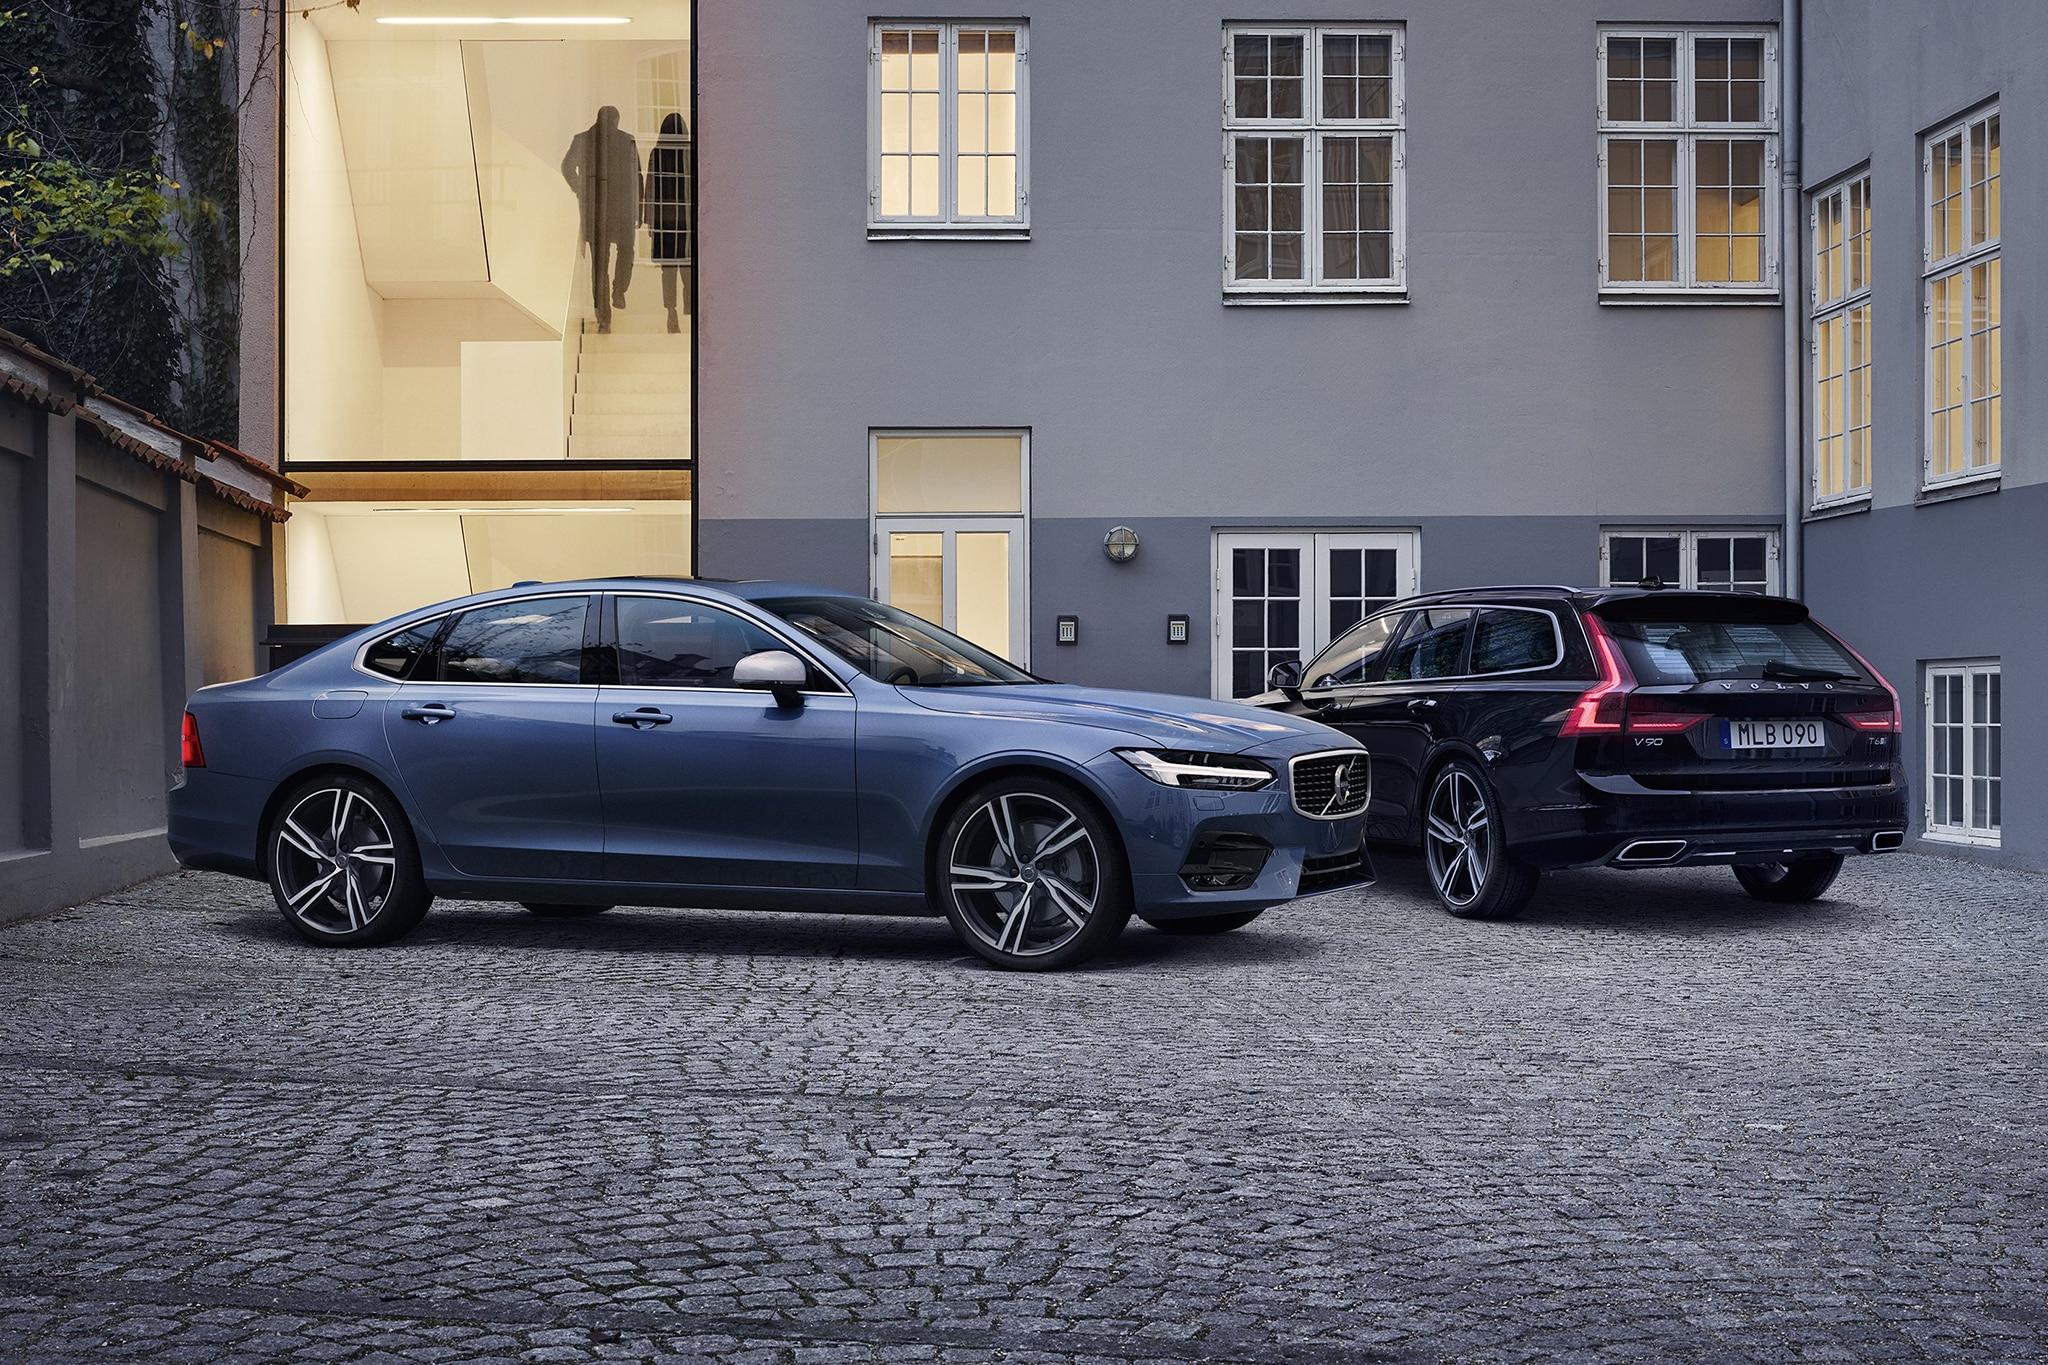 Luxury 2017 Volvo S90 Luxury Sedan Fully Revealed With XC90